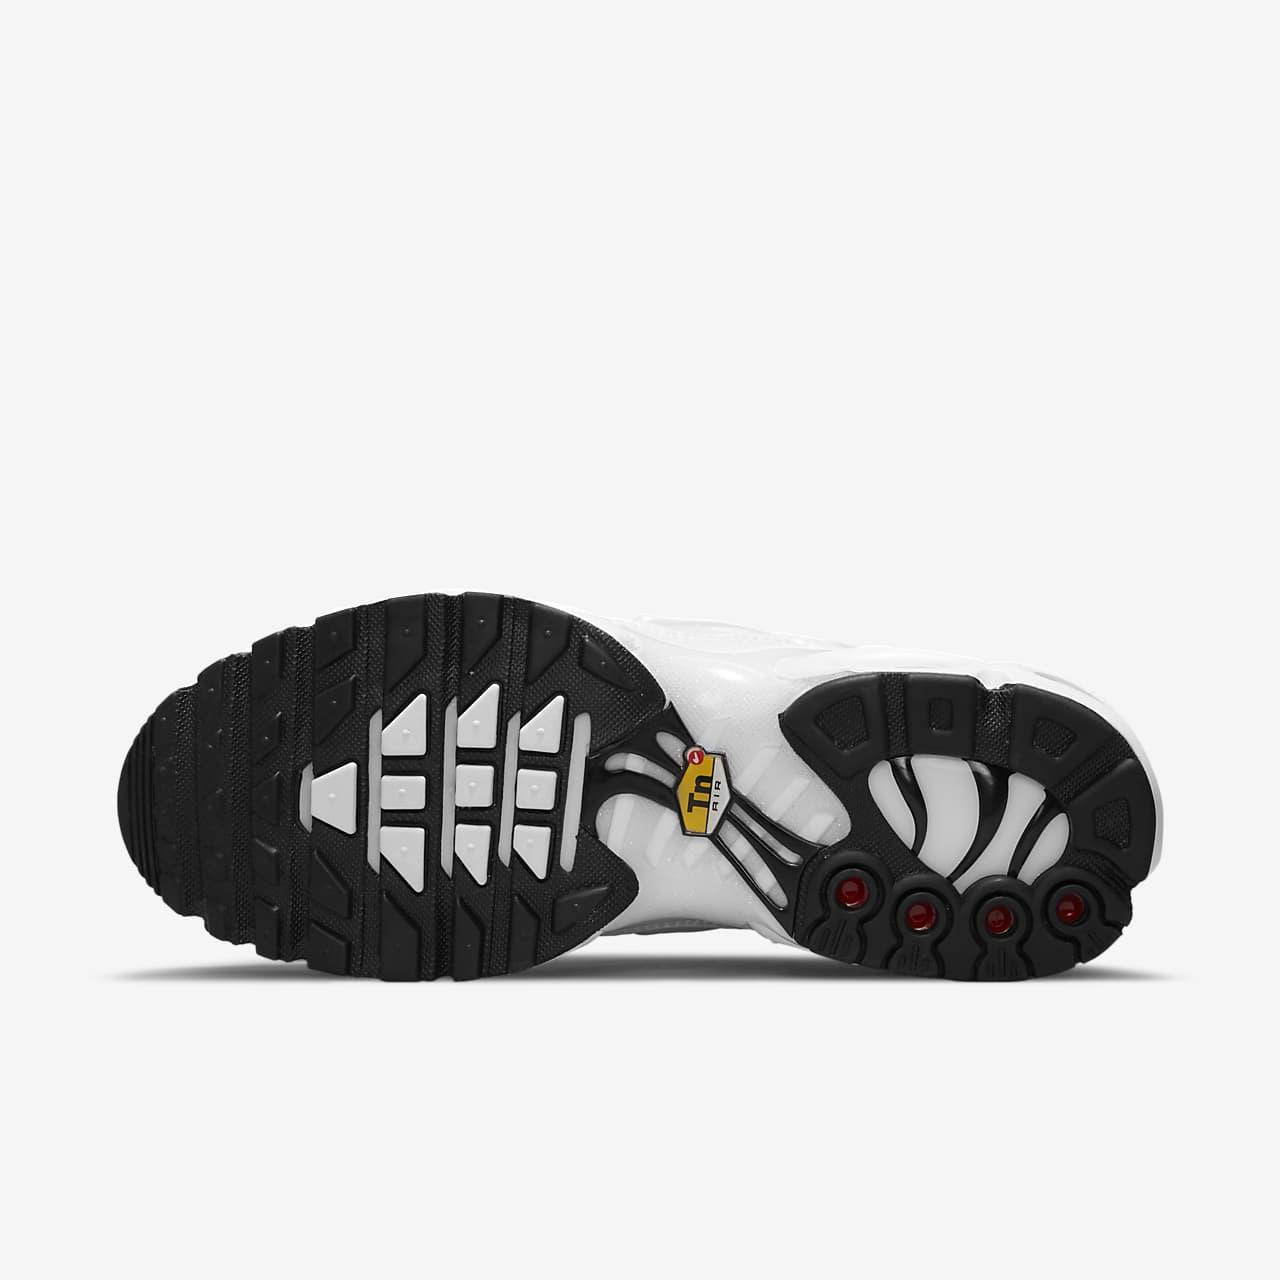 Buty Lifestyle Nike Air Max Plus Premium Damskie Czarne